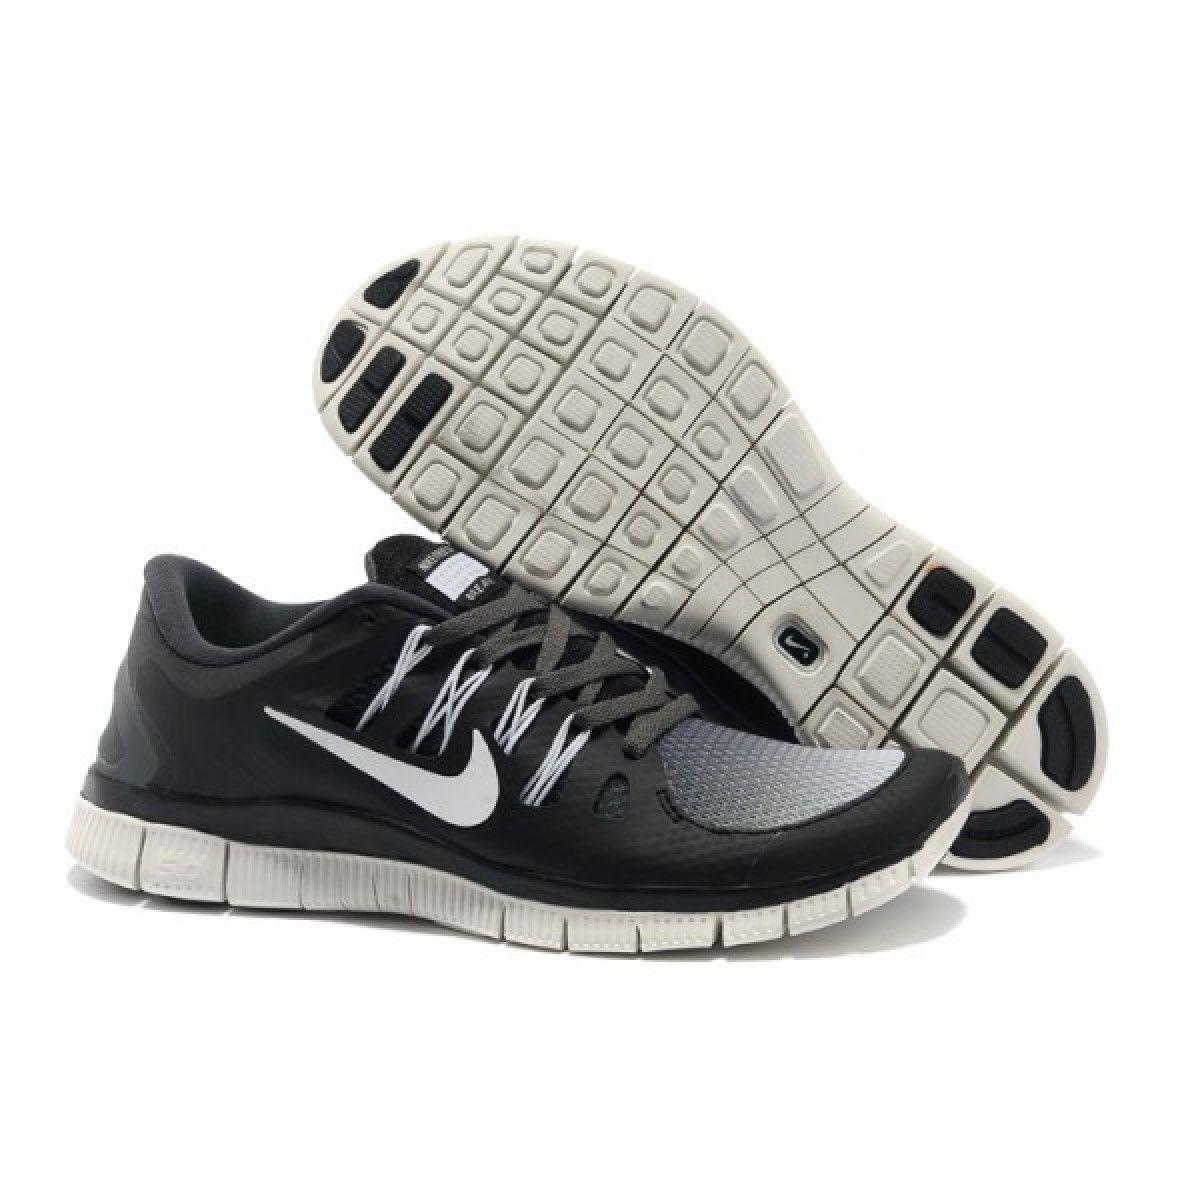 the best attitude e1e14 cc9ef Nike Free 5.0 V2 Mens Black Gradient White